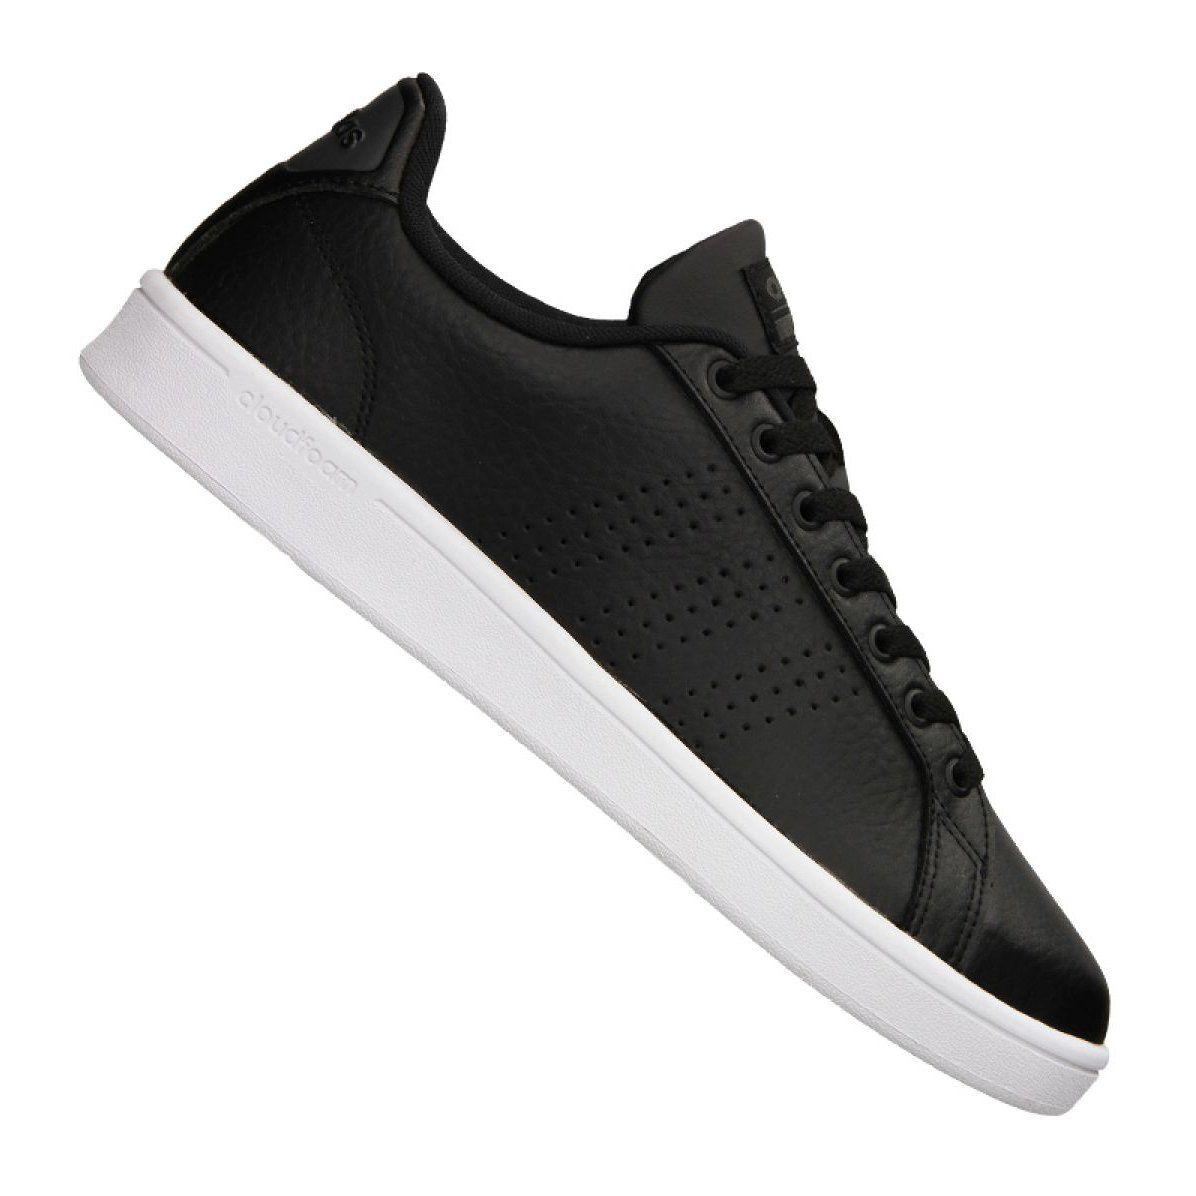 Buty Adidas Cloudfoam Adventage Clean M Aw3915 Czarne Adidas Cloudfoam Black Shoes Sports Shoes Adidas